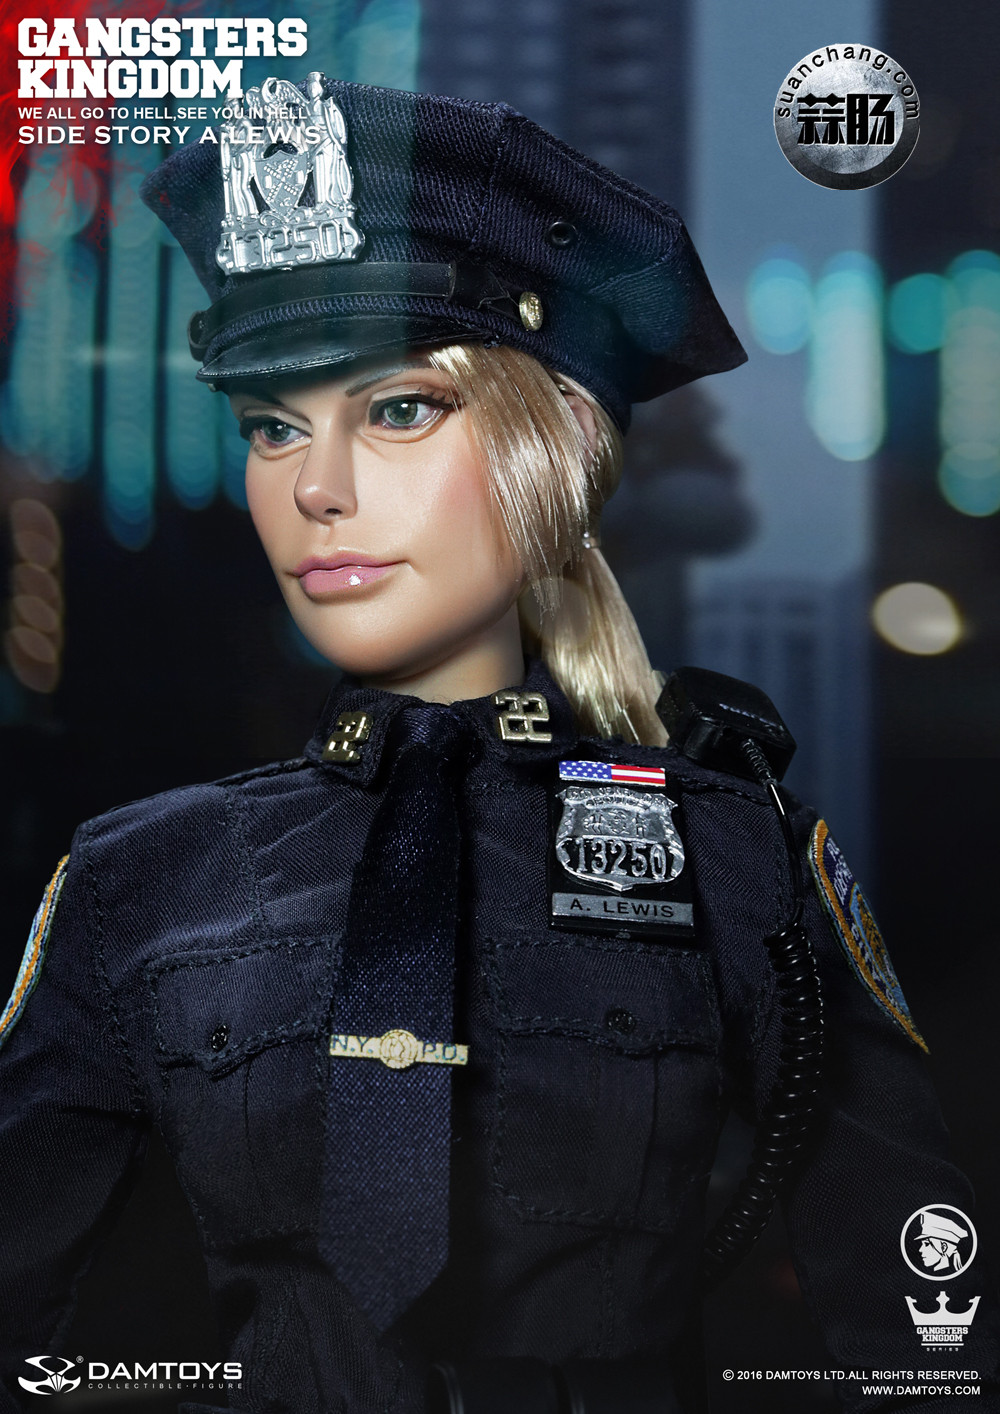 DAMTOYS 1/6黑帮王国系列 番外篇:安妮·刘易斯 警官 模玩 第7张